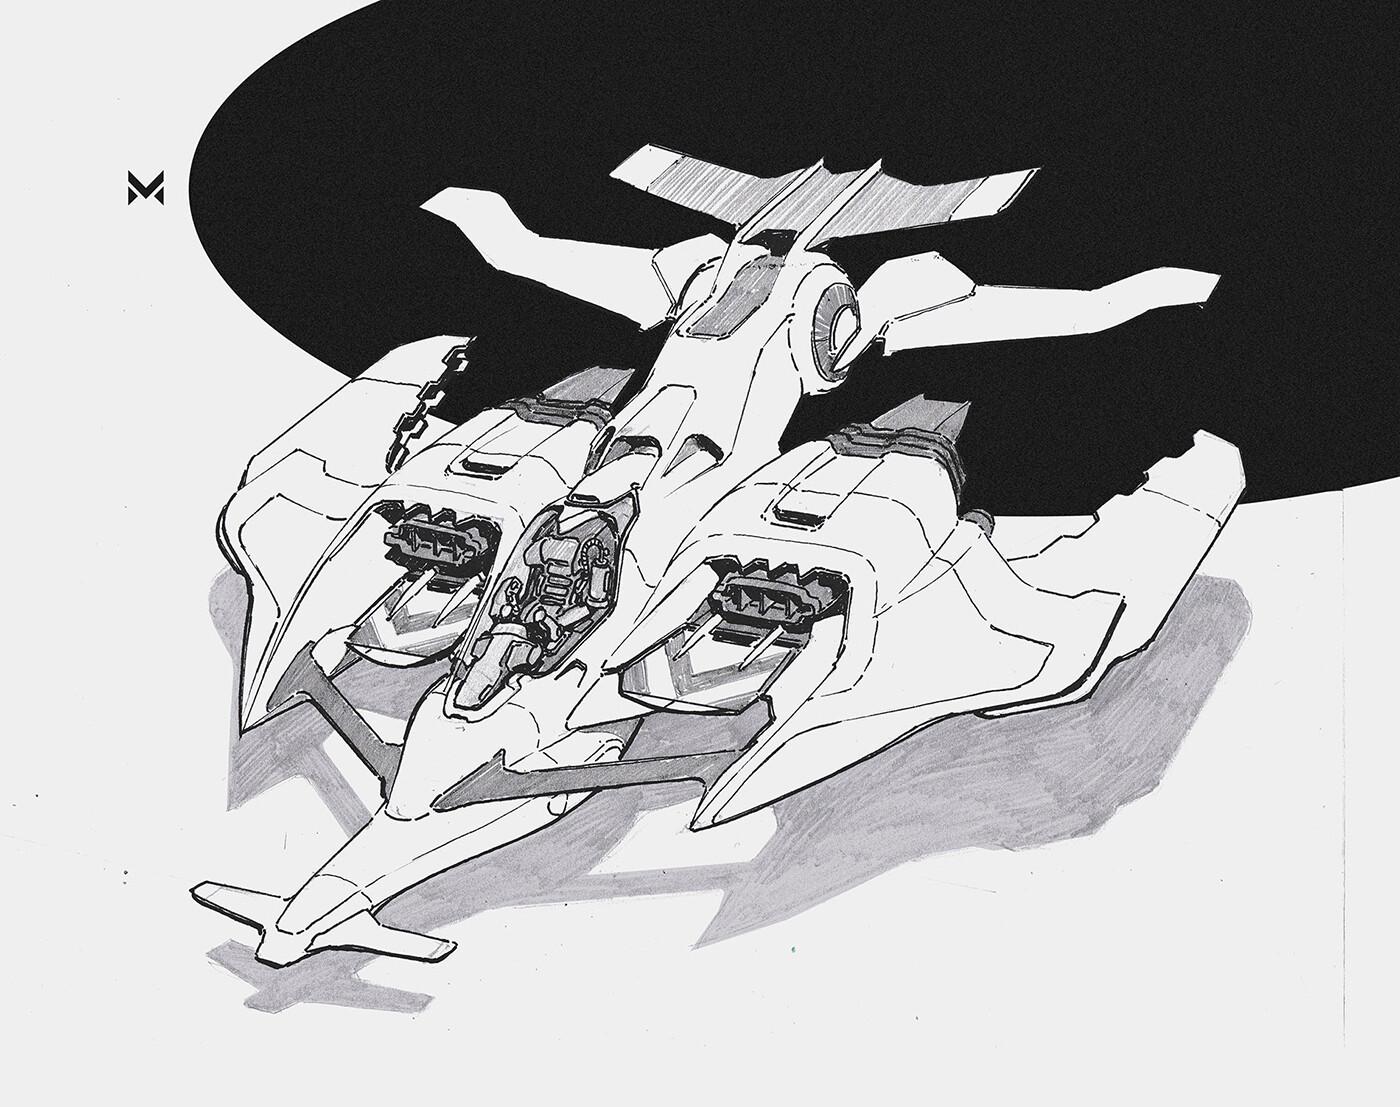 Spacecraft concept - agile light fighter